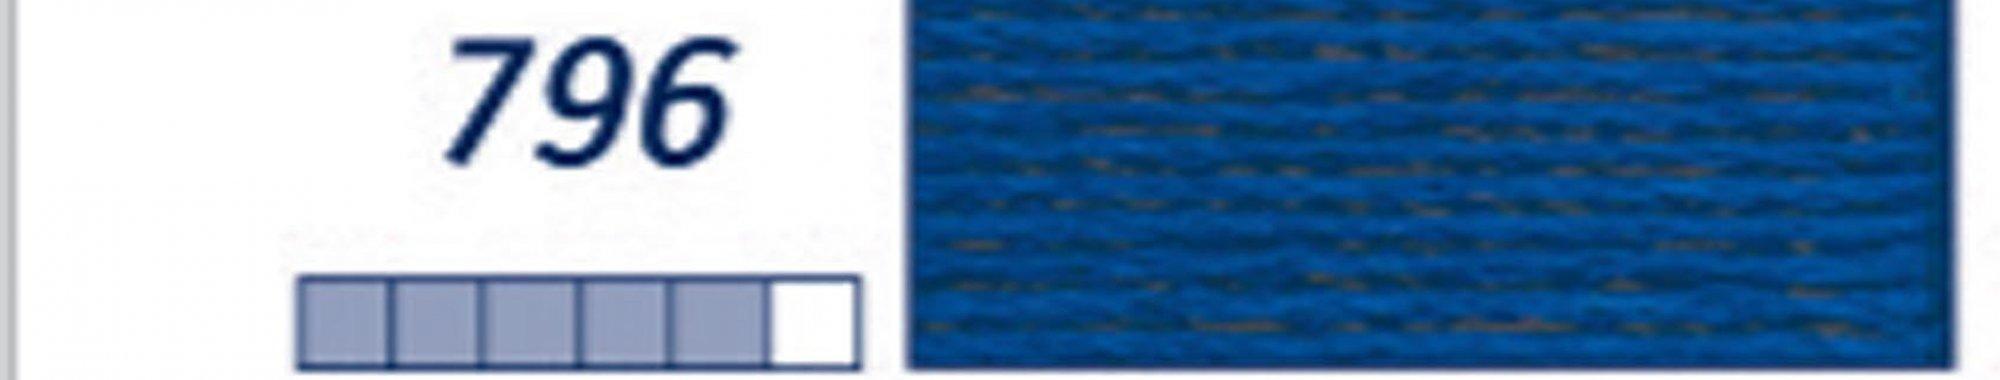 DP3-796-DK ROYAL BLUE